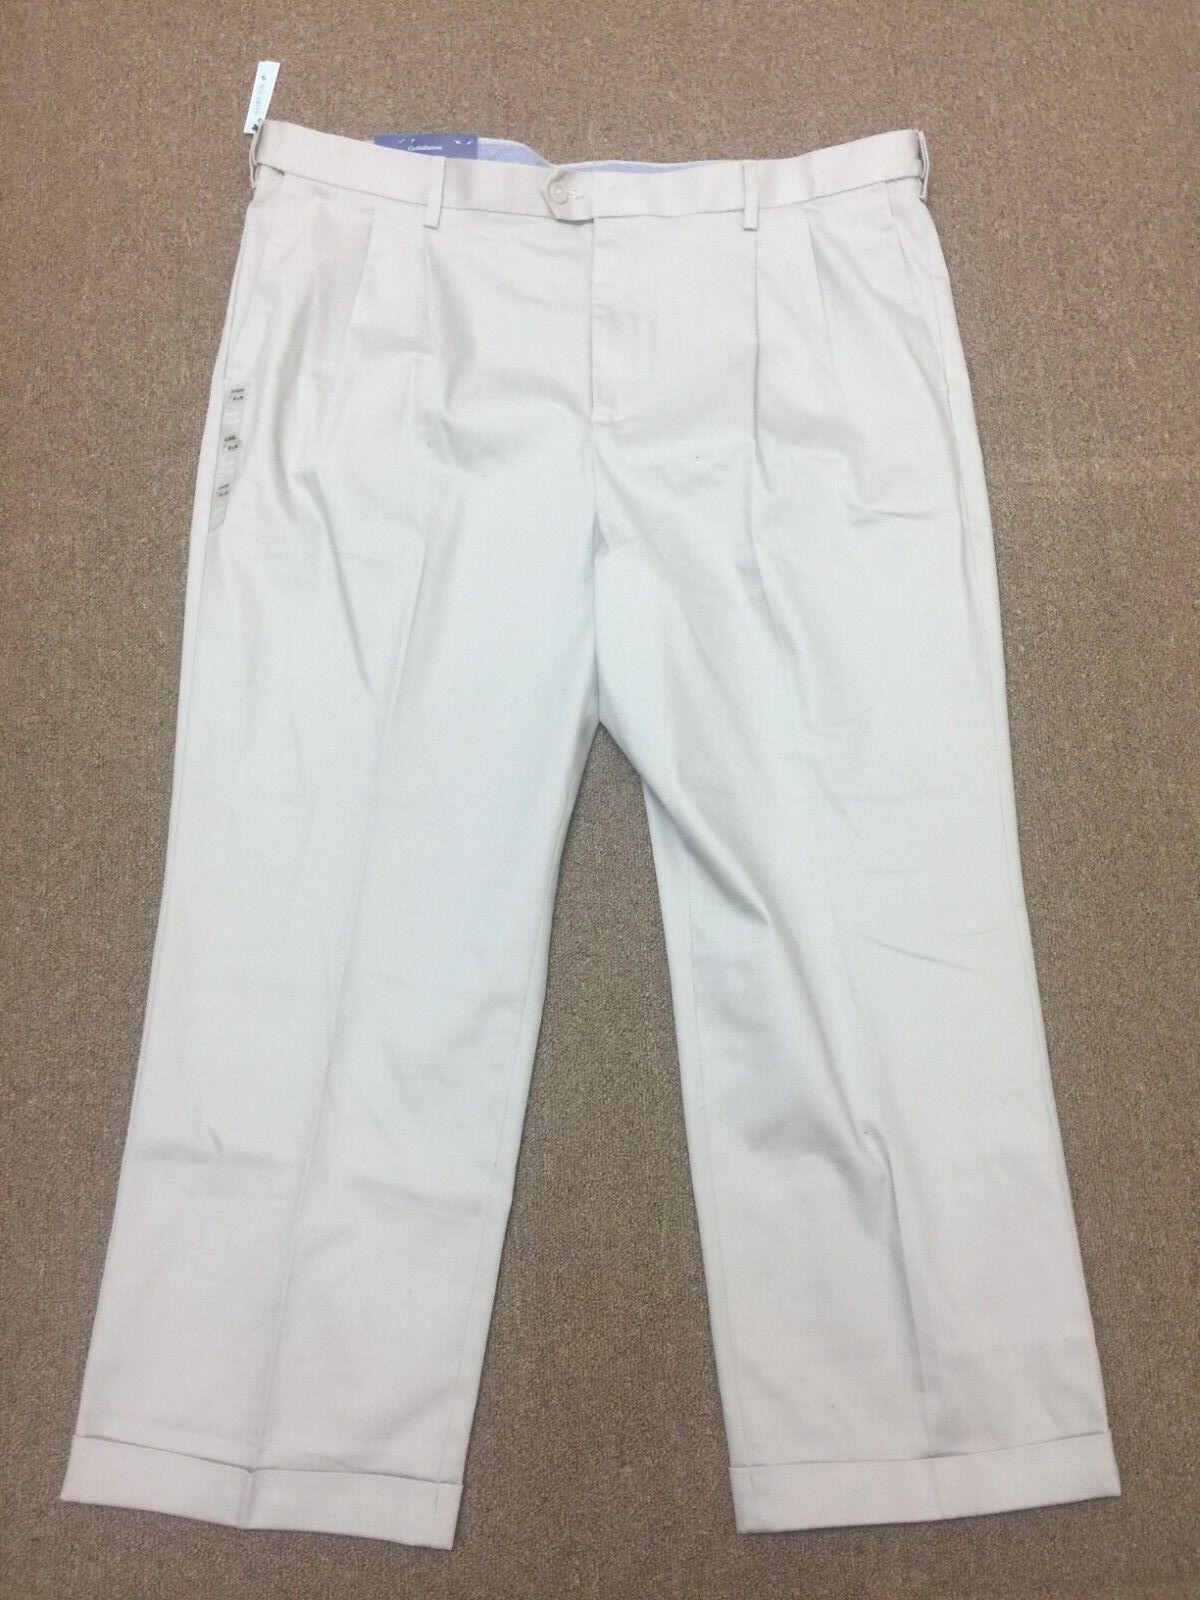 NWT  Croft & Barrow No Iron Stretch Beige Tan Pleated Khaki Classic Fit 42 x 30